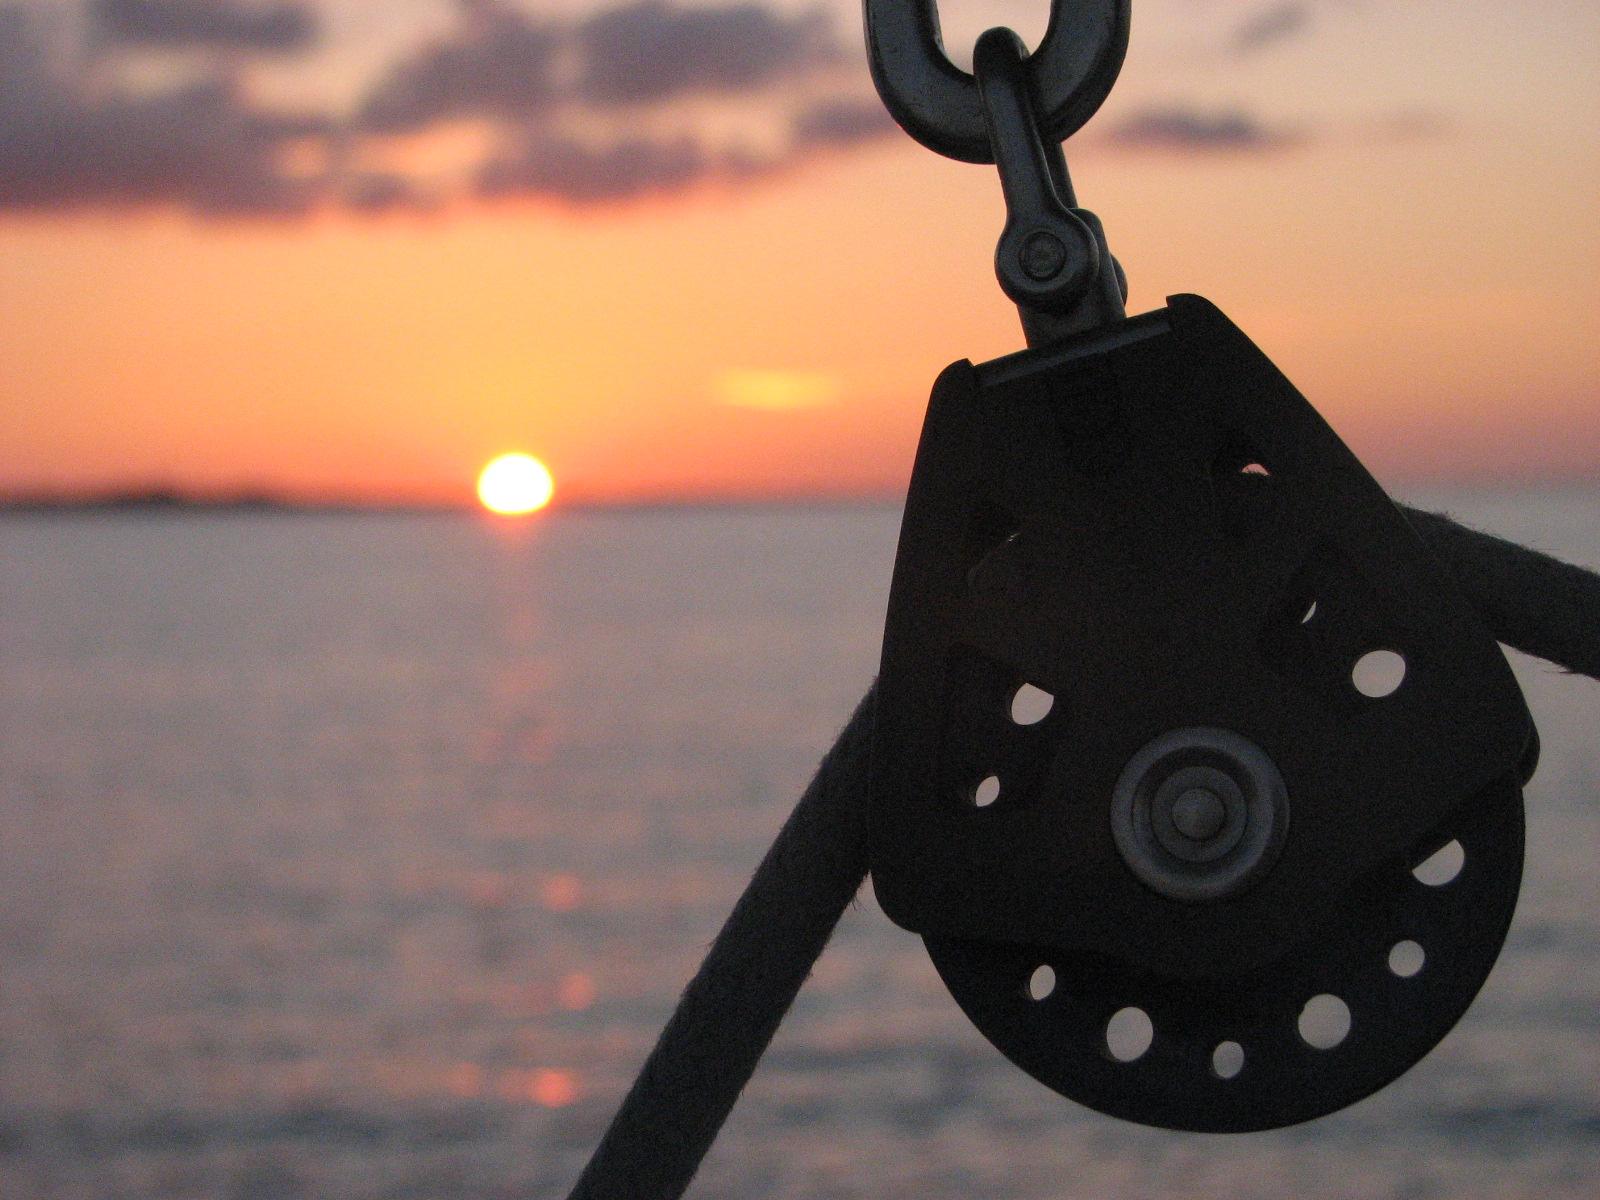 Lightheart at Sunset